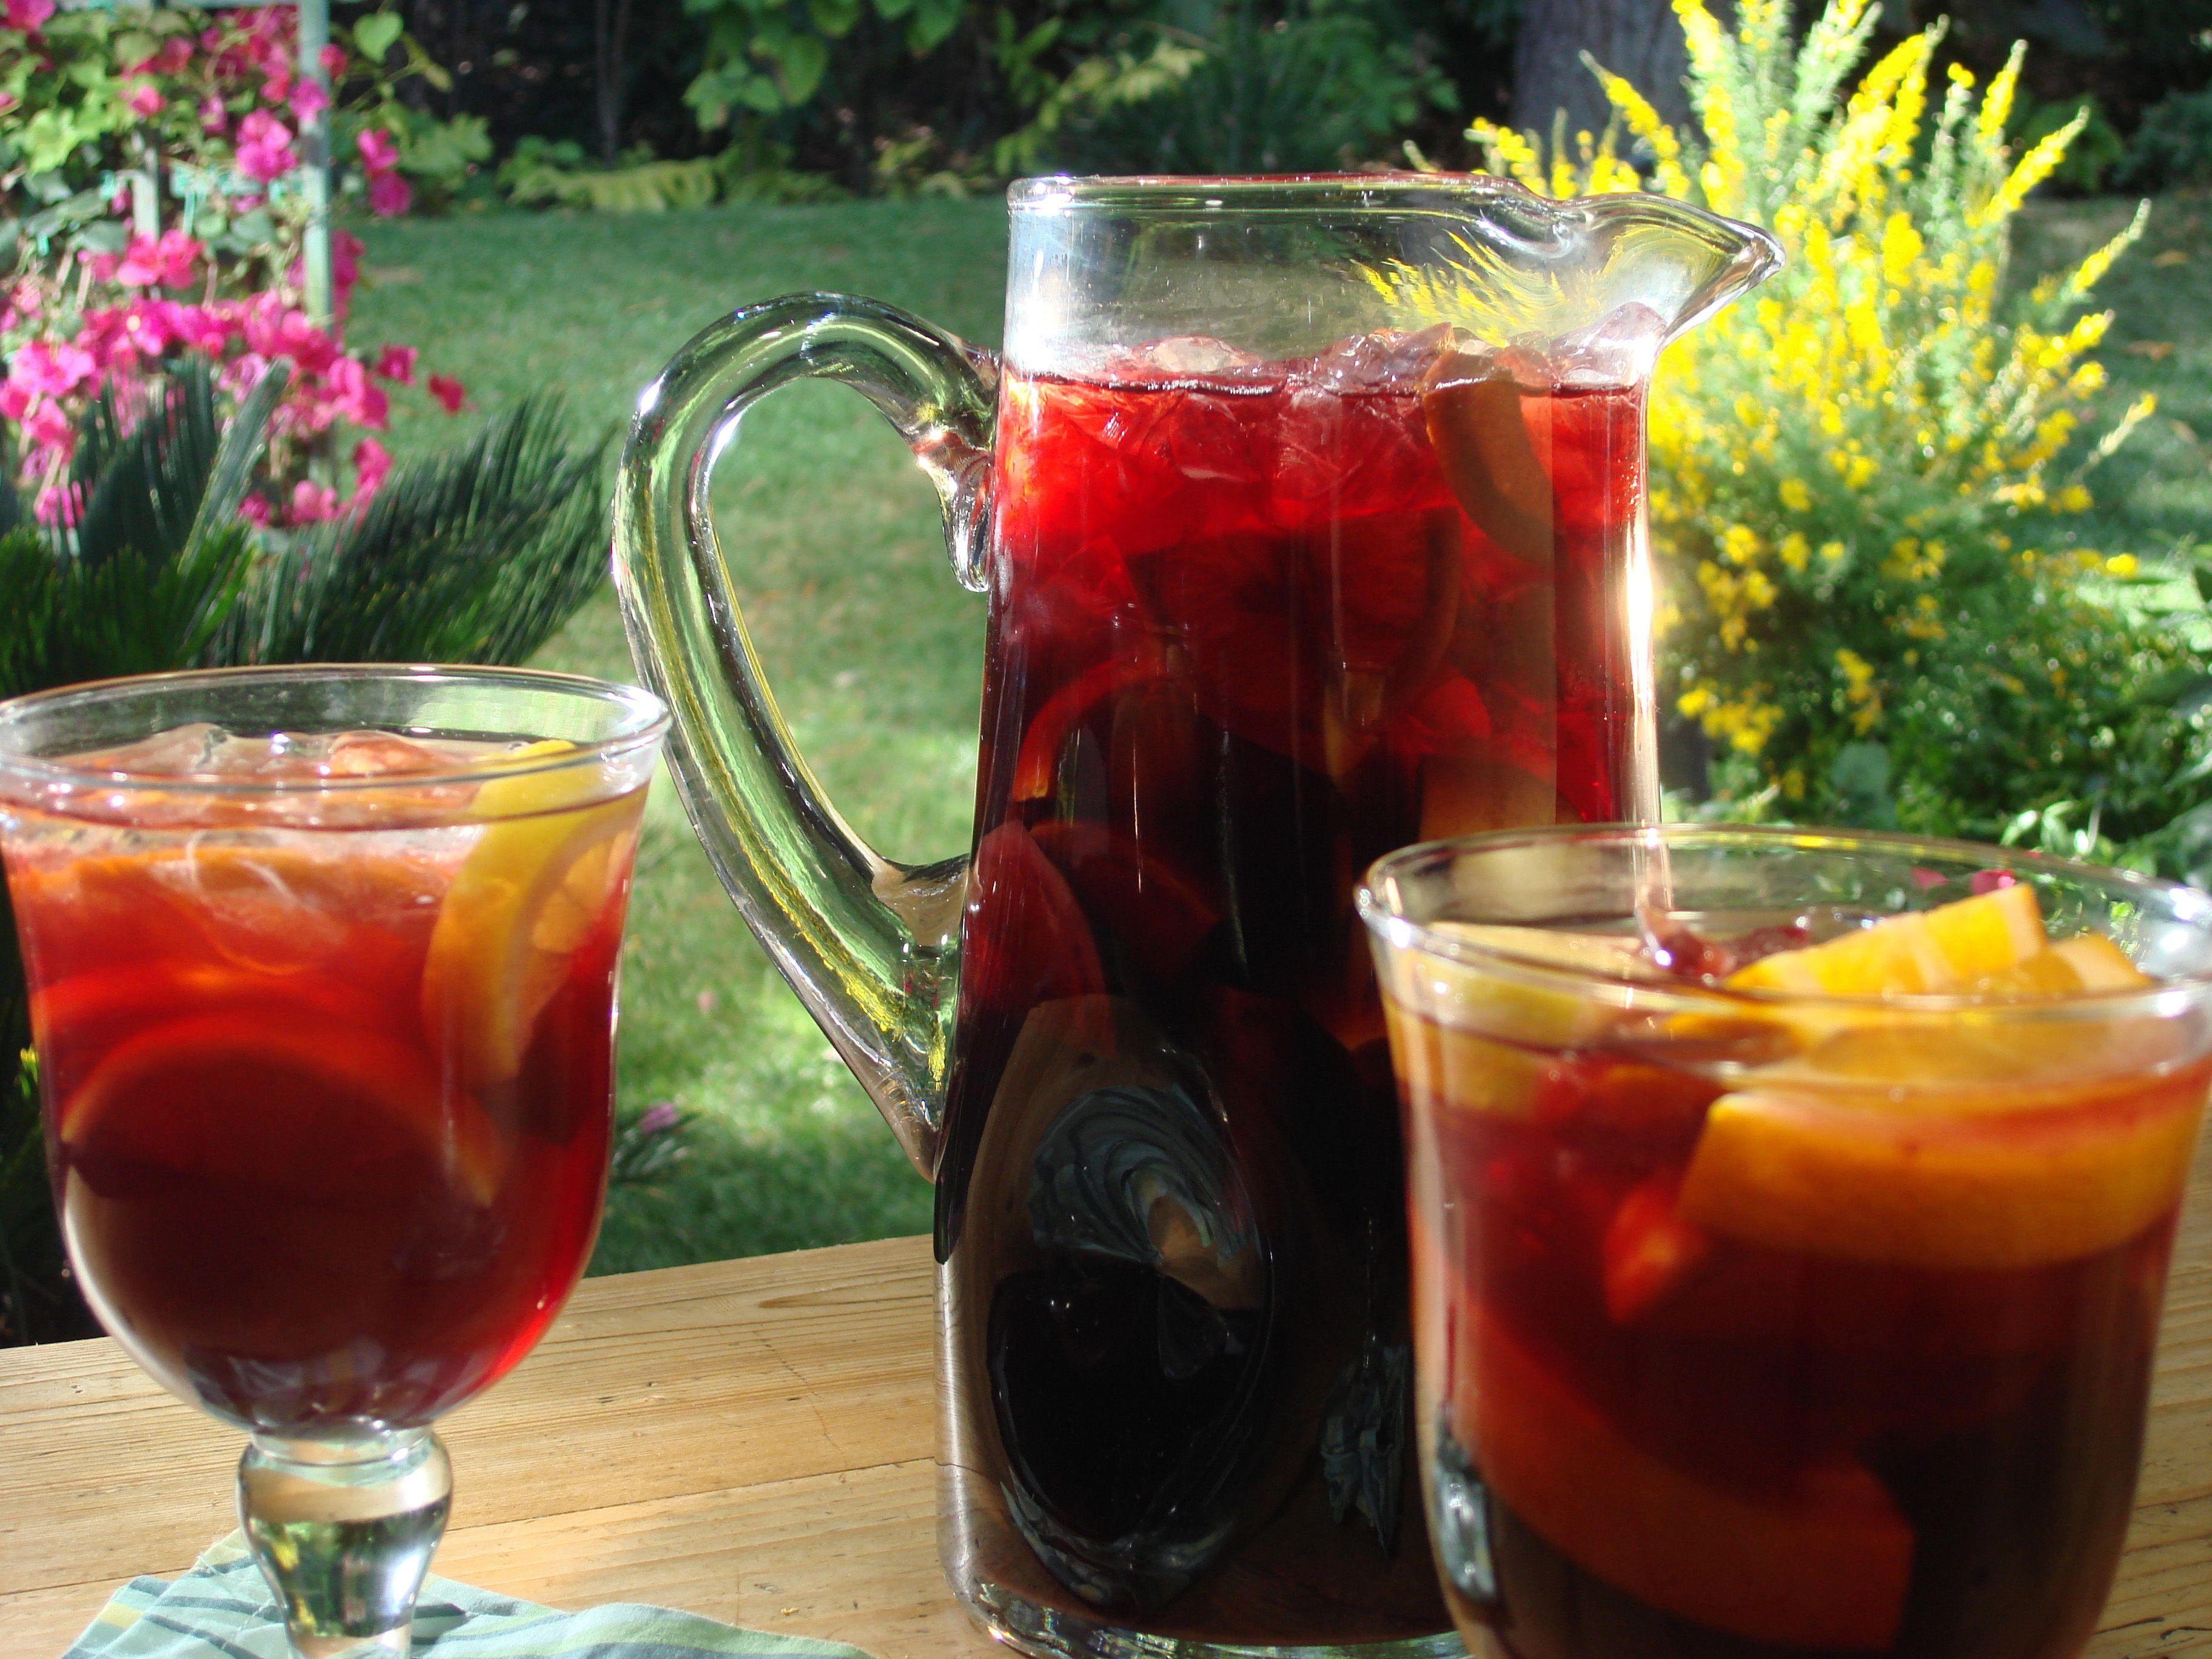 Spanish Sangria Recipe With Images Spanish Sangria Recipe Sangria Recipes Summer Sangria Recipes